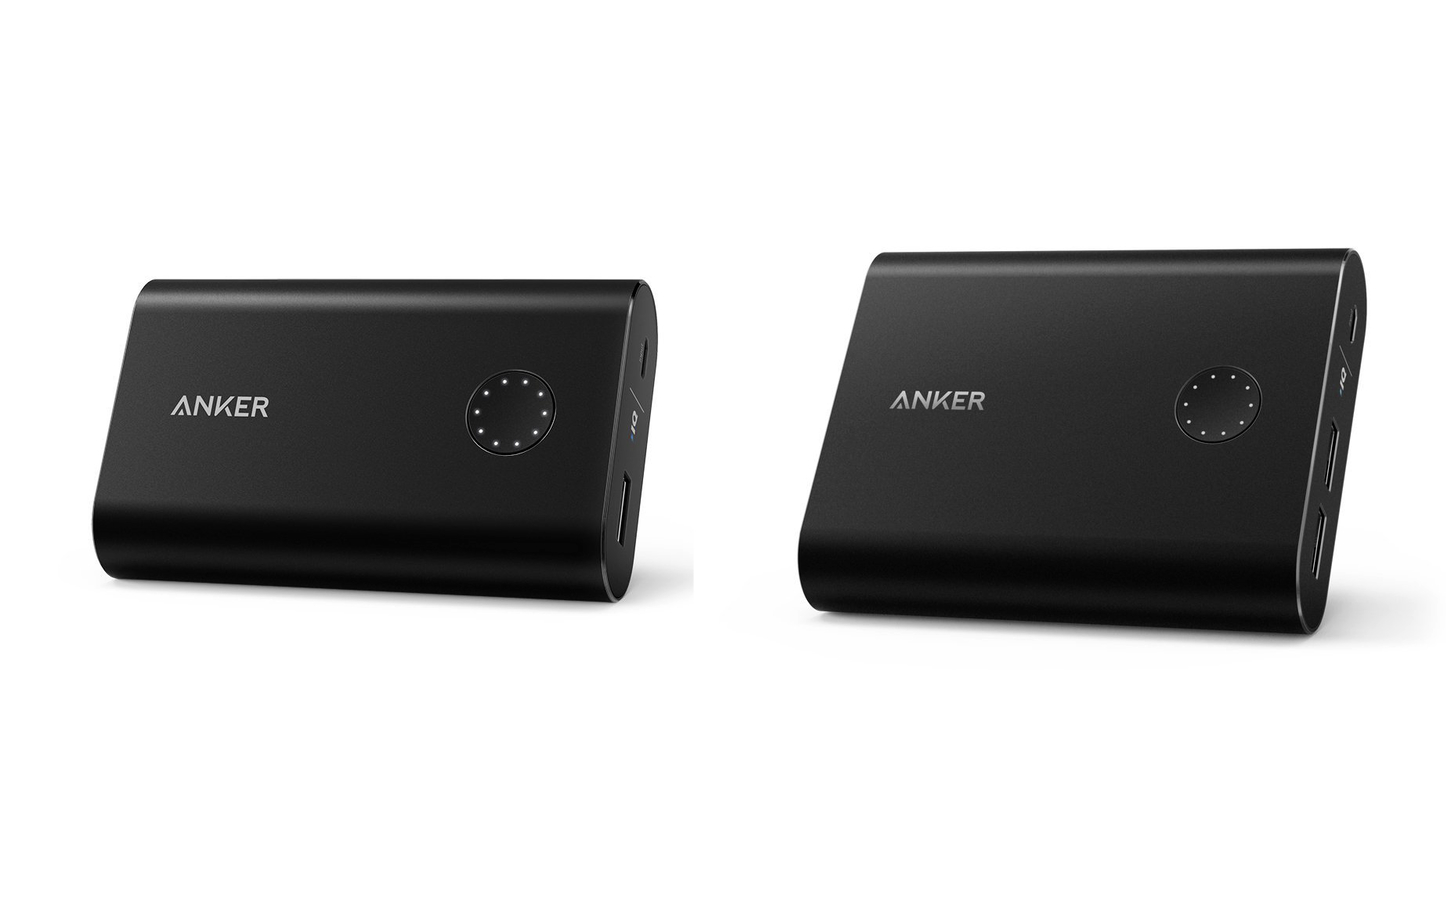 Anker PowerCore Series